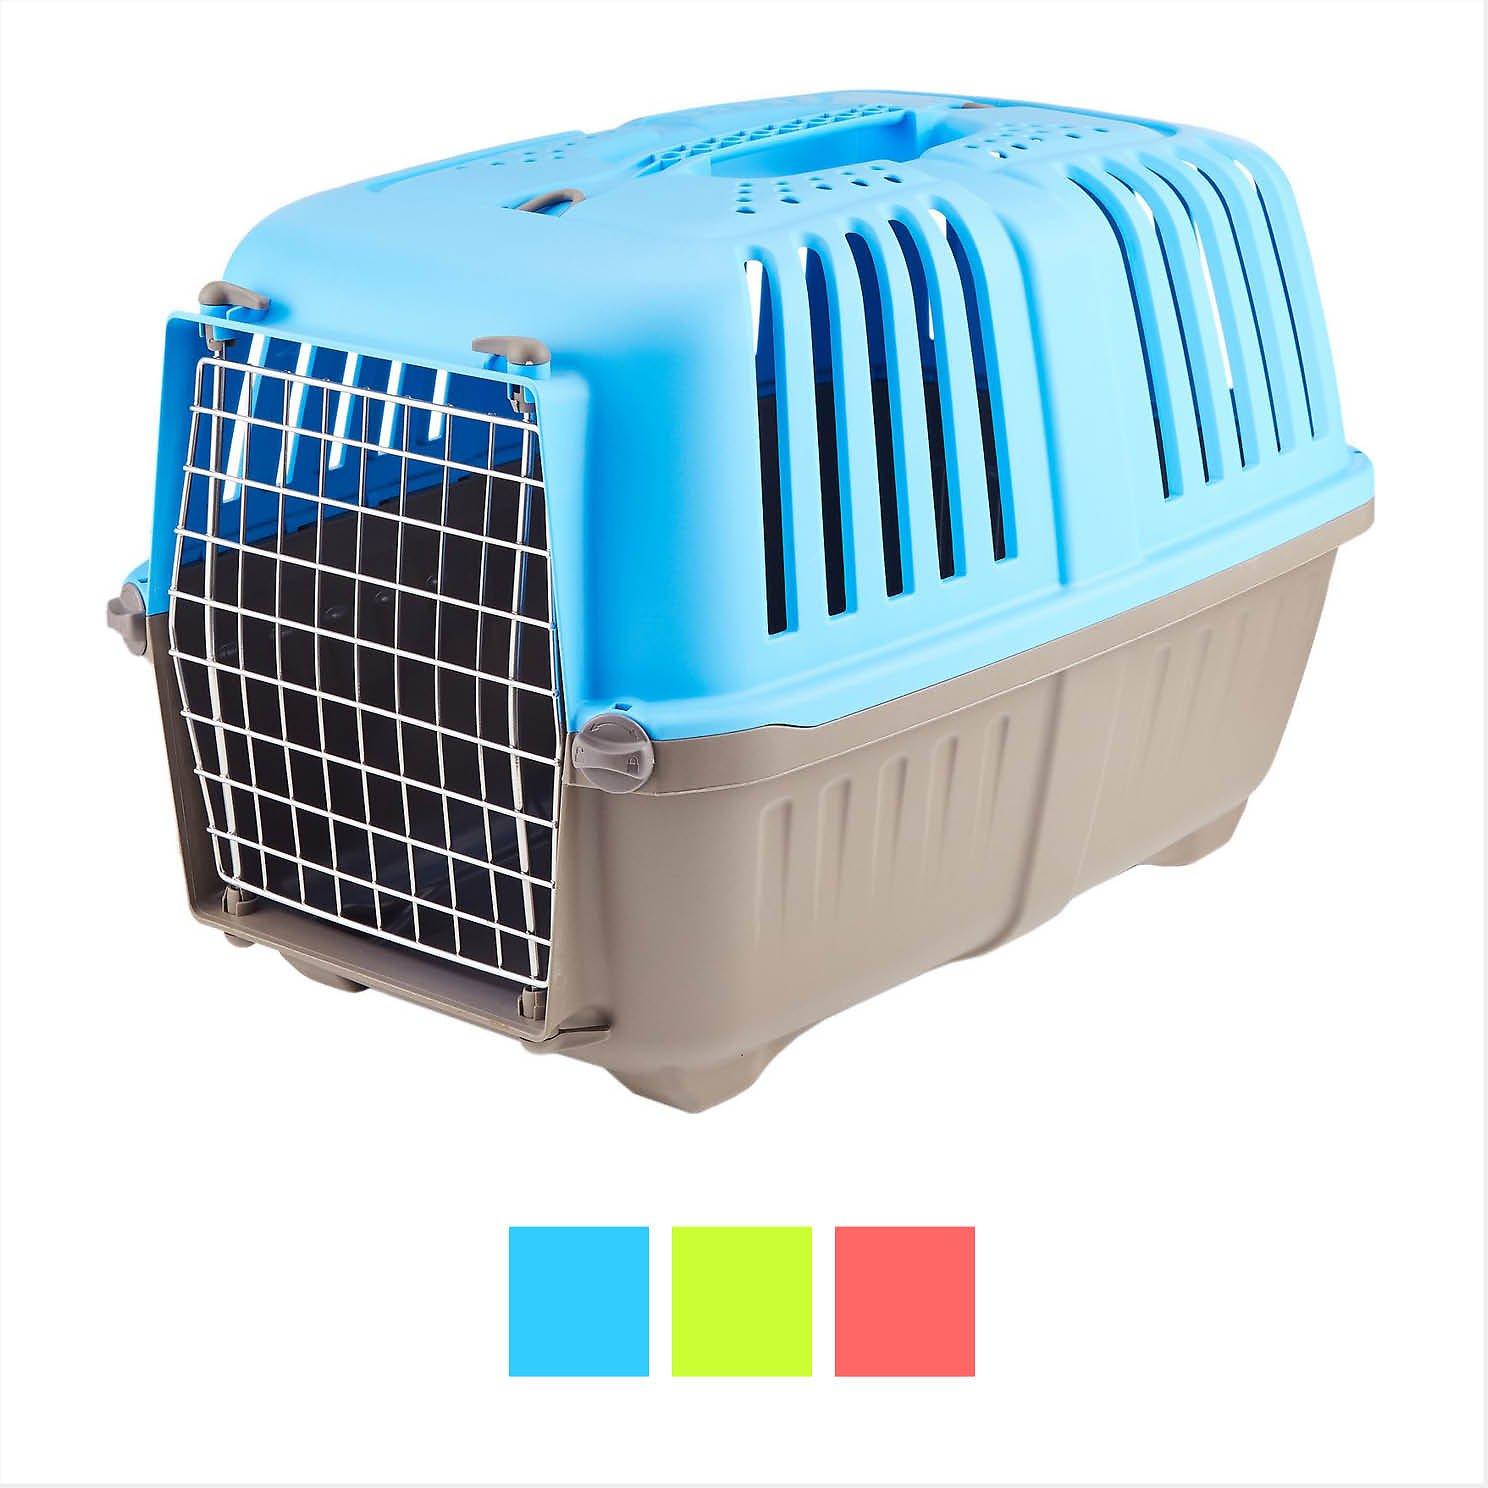 MidWest Spree Plastic Pet Carrier, Blue Image